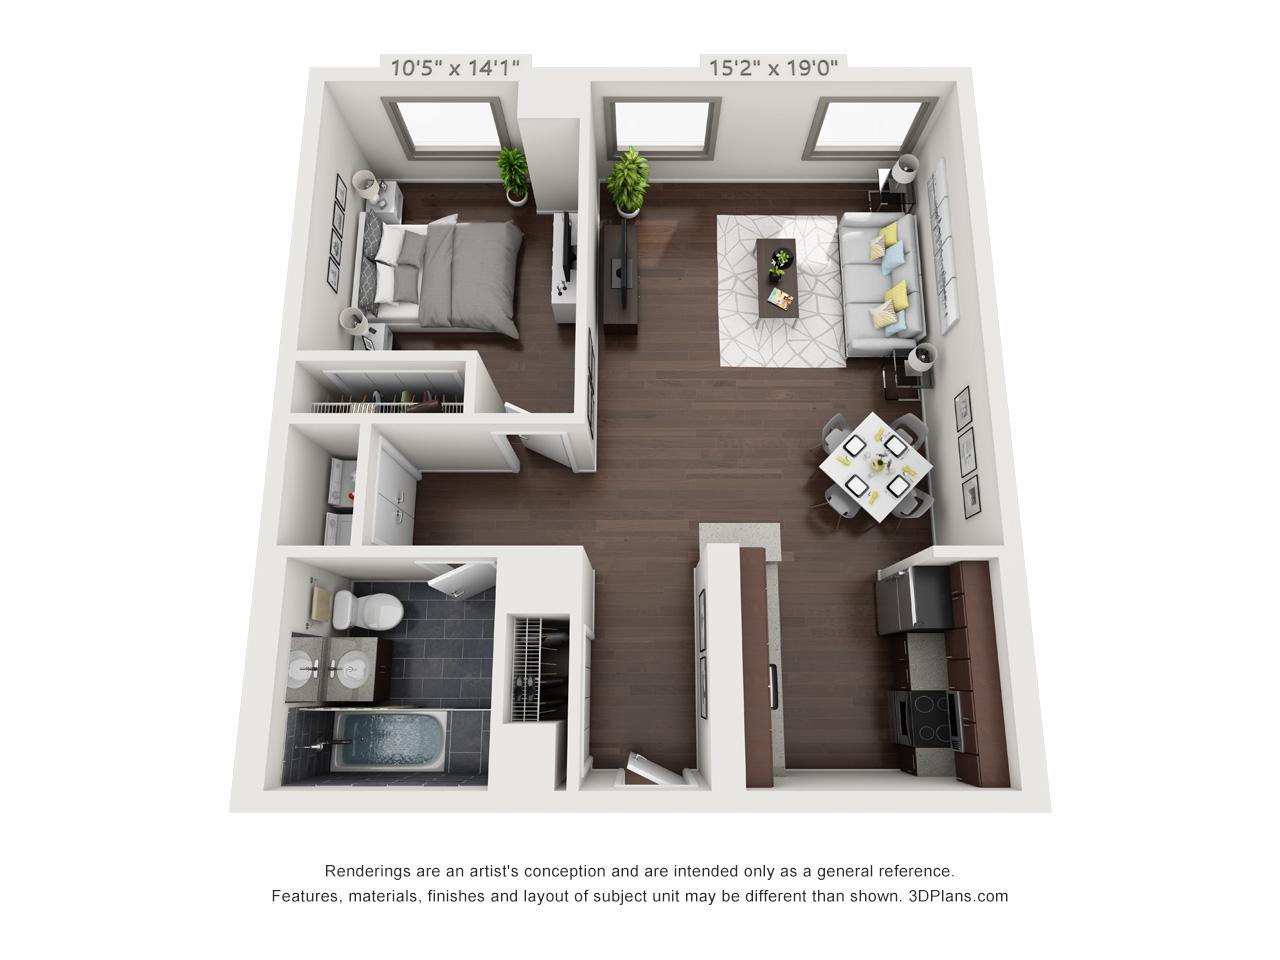 fairmount apartments - 1 bedroom